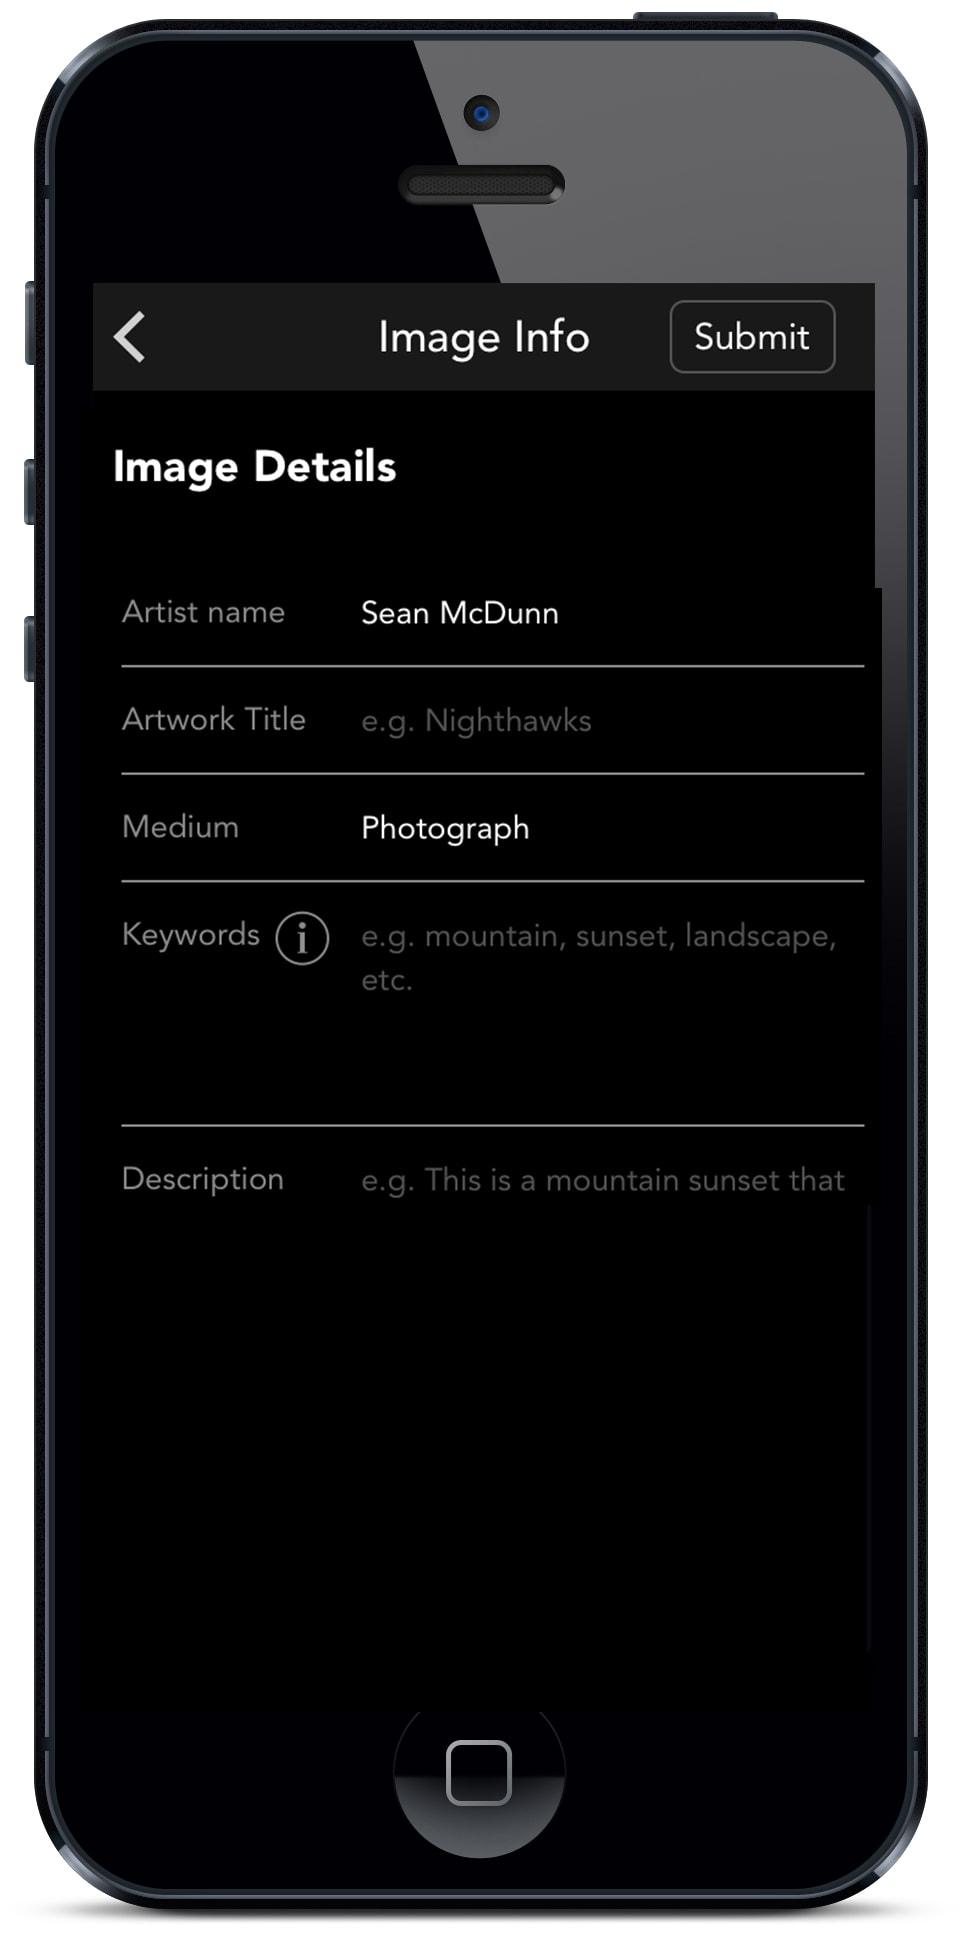 Mobile App Screen Capture